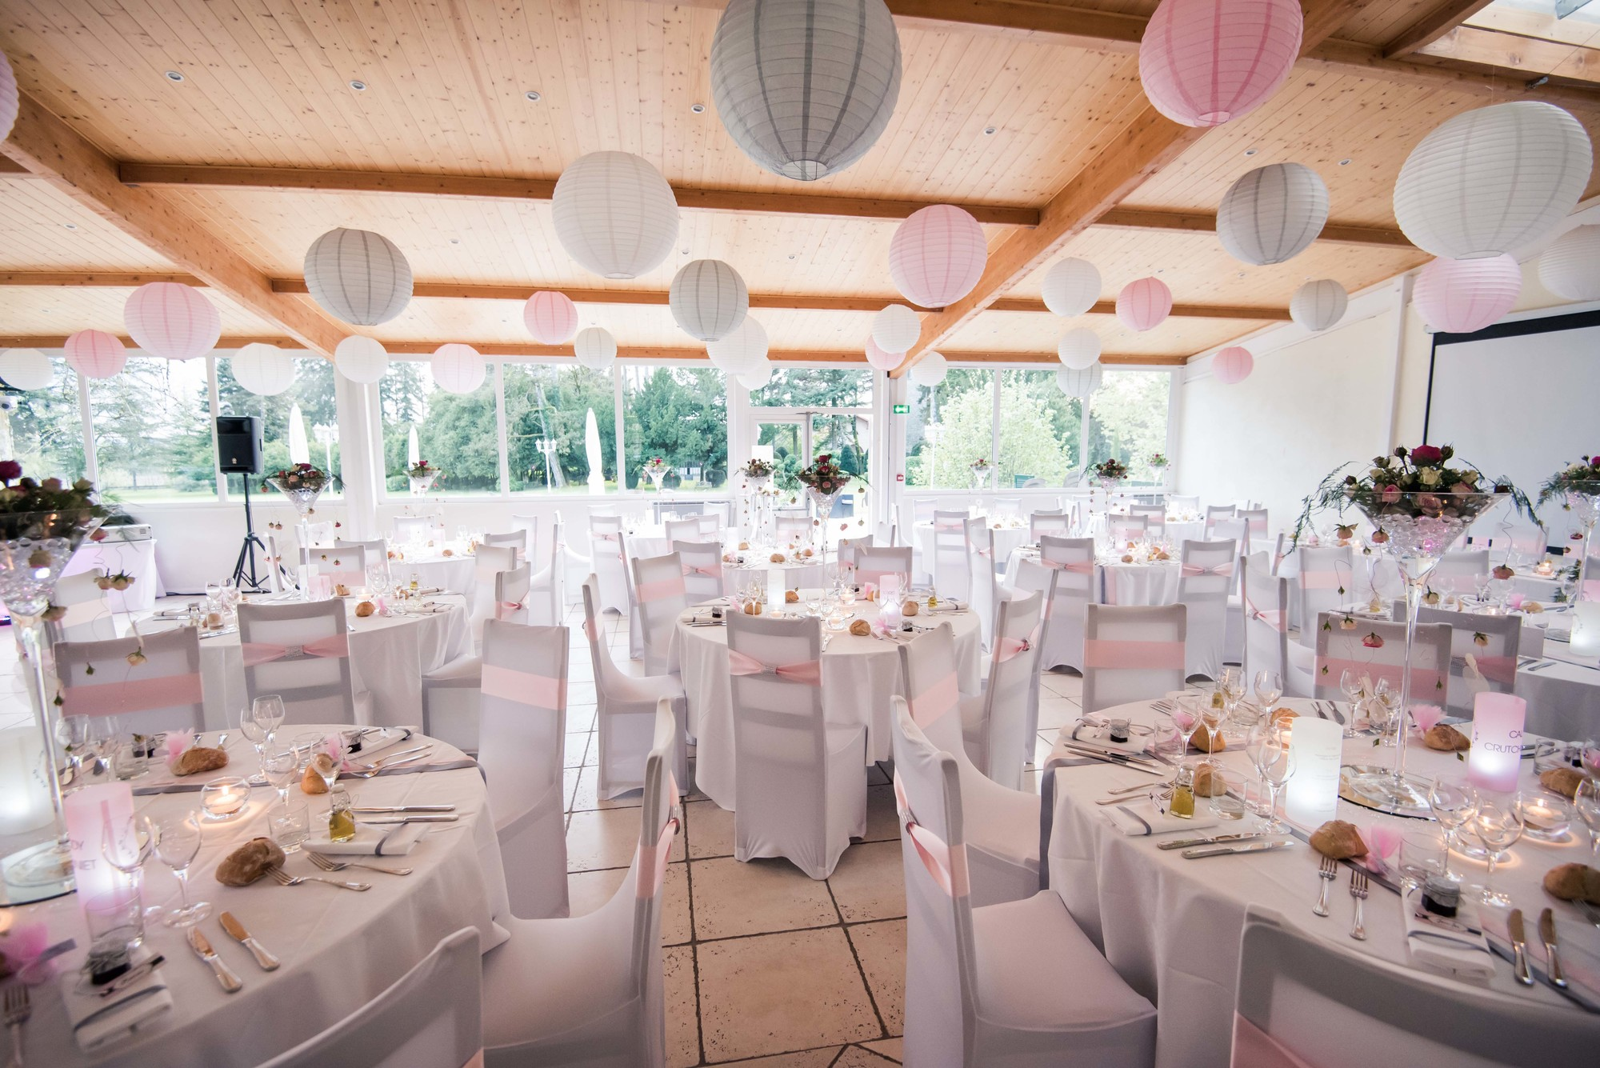 Salle des Cèdres mariage rose